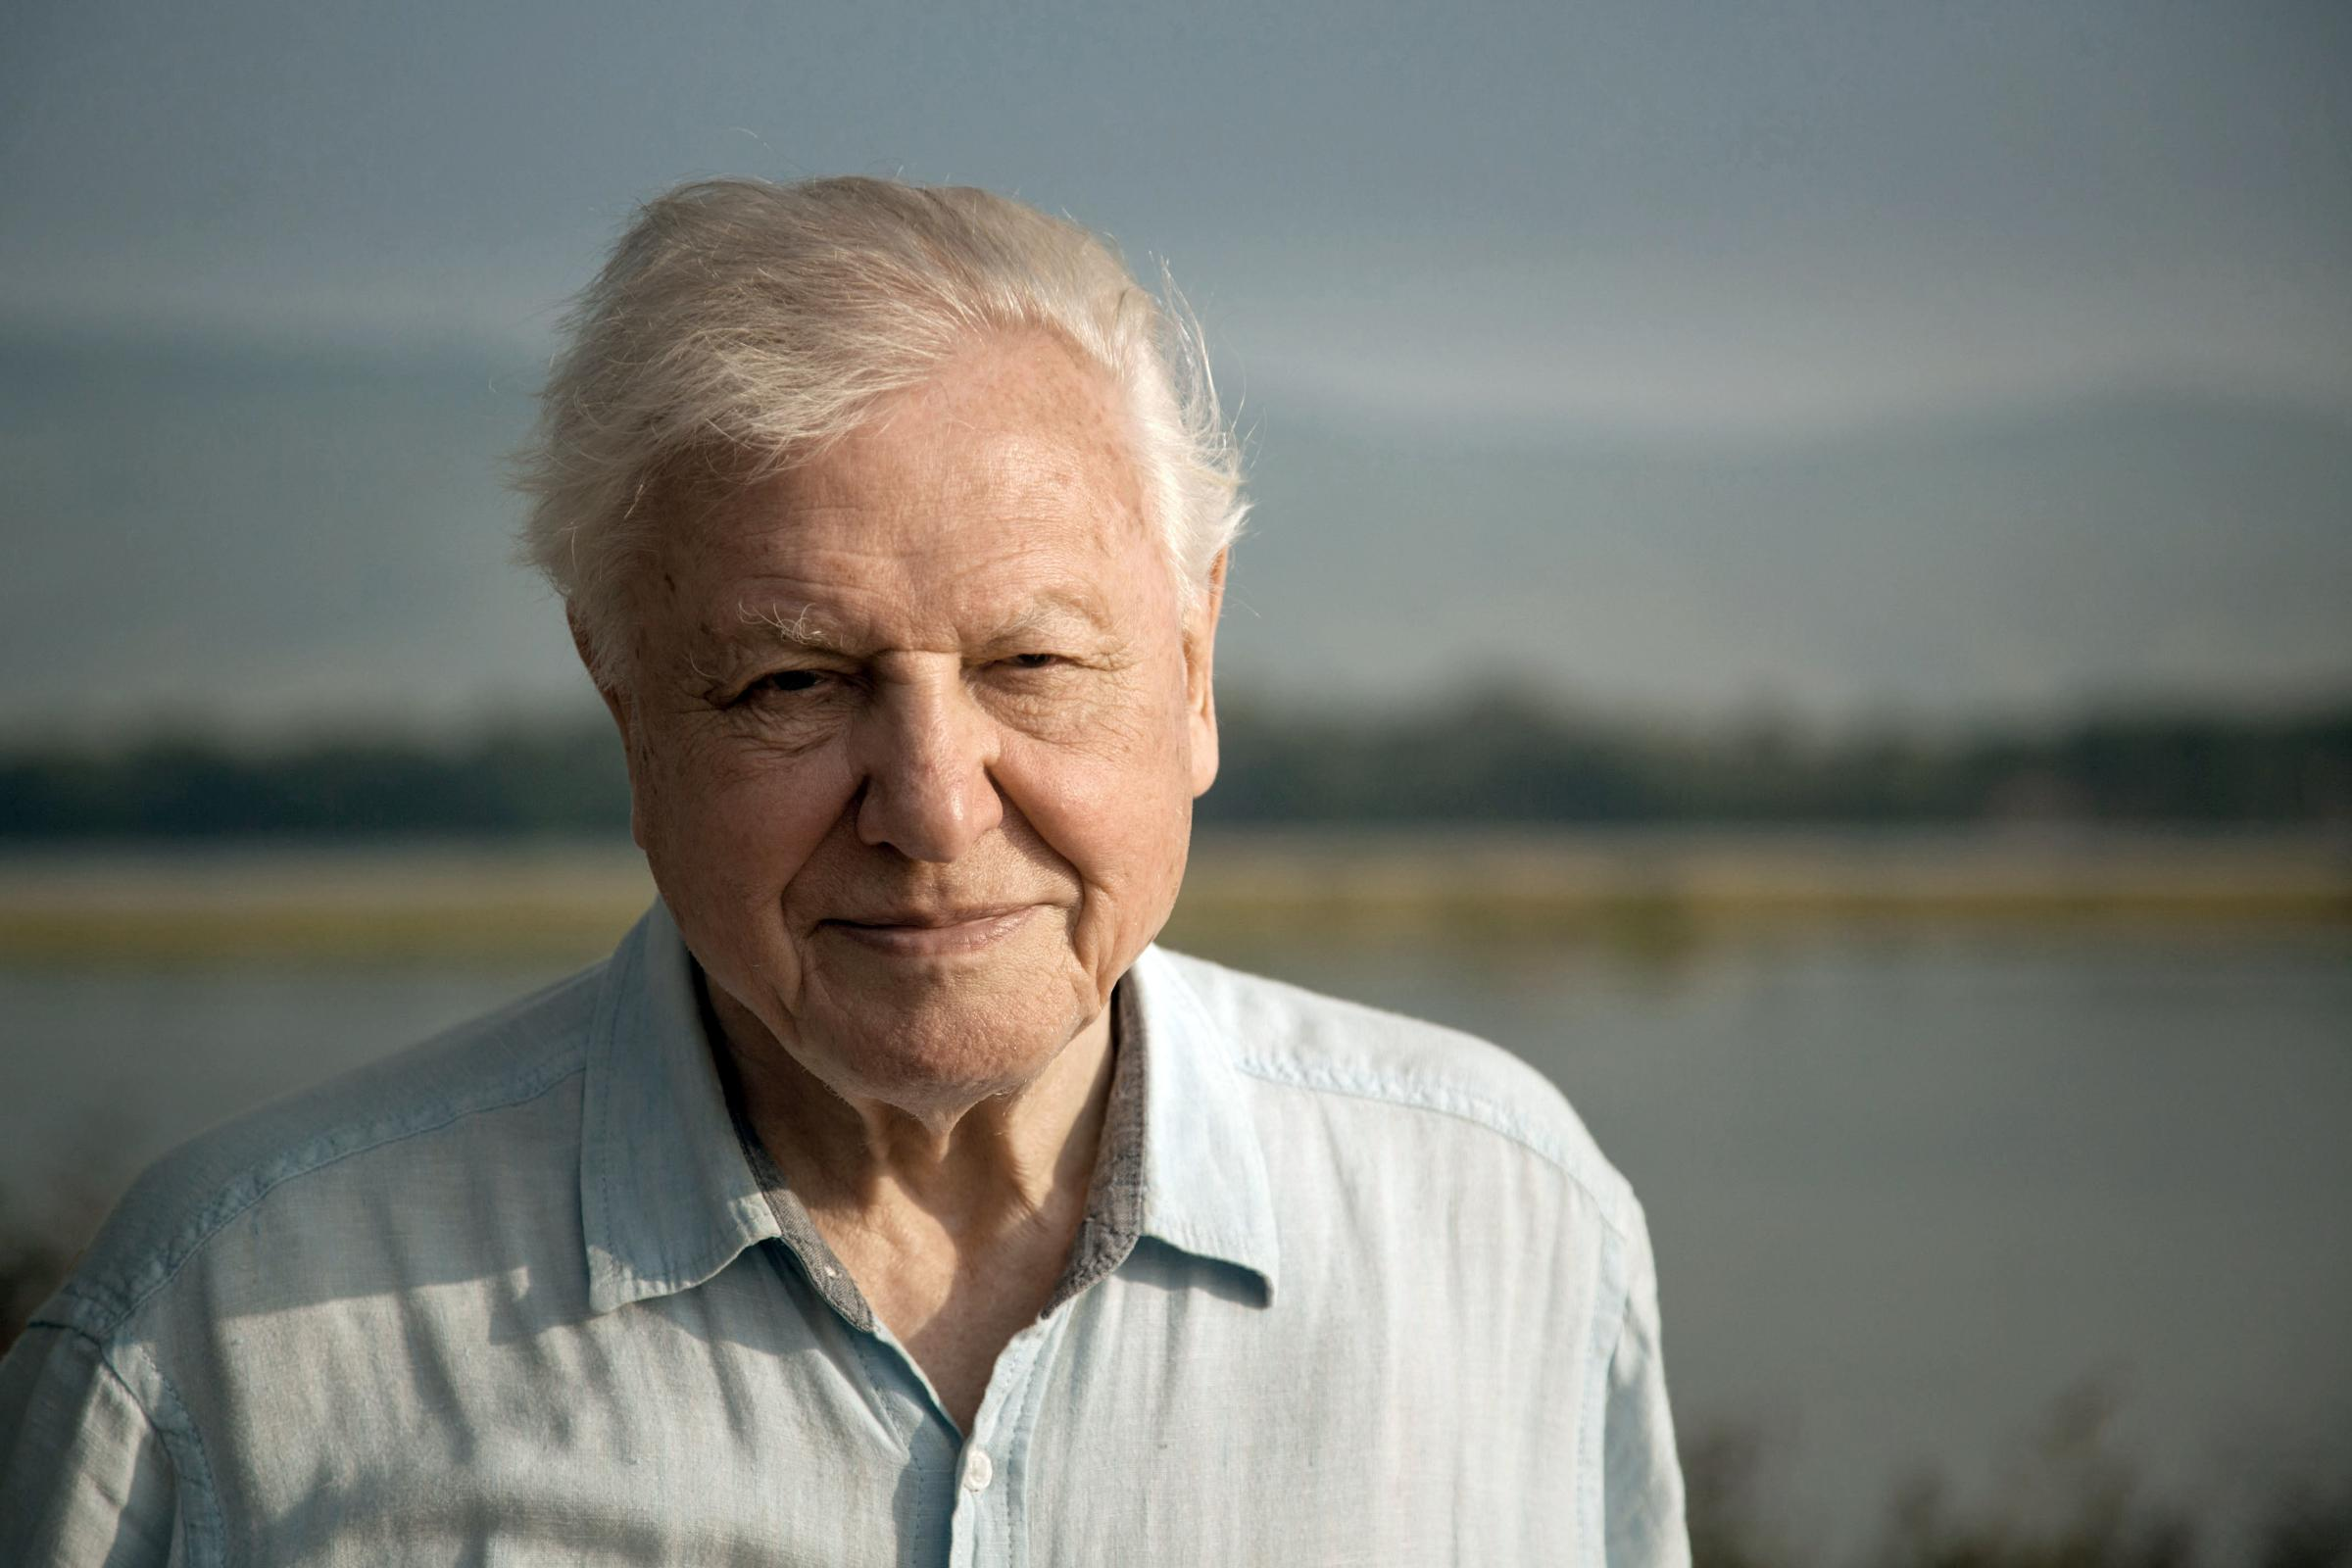 Kelp harvesting bid sparks plea from Sir David Attenborough